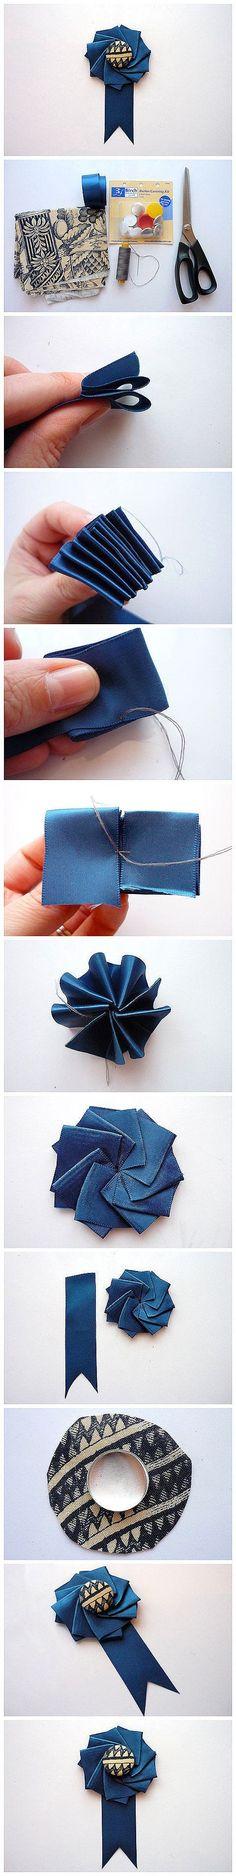 DIY Ribbon - Inspiring picture on Joyzz.com